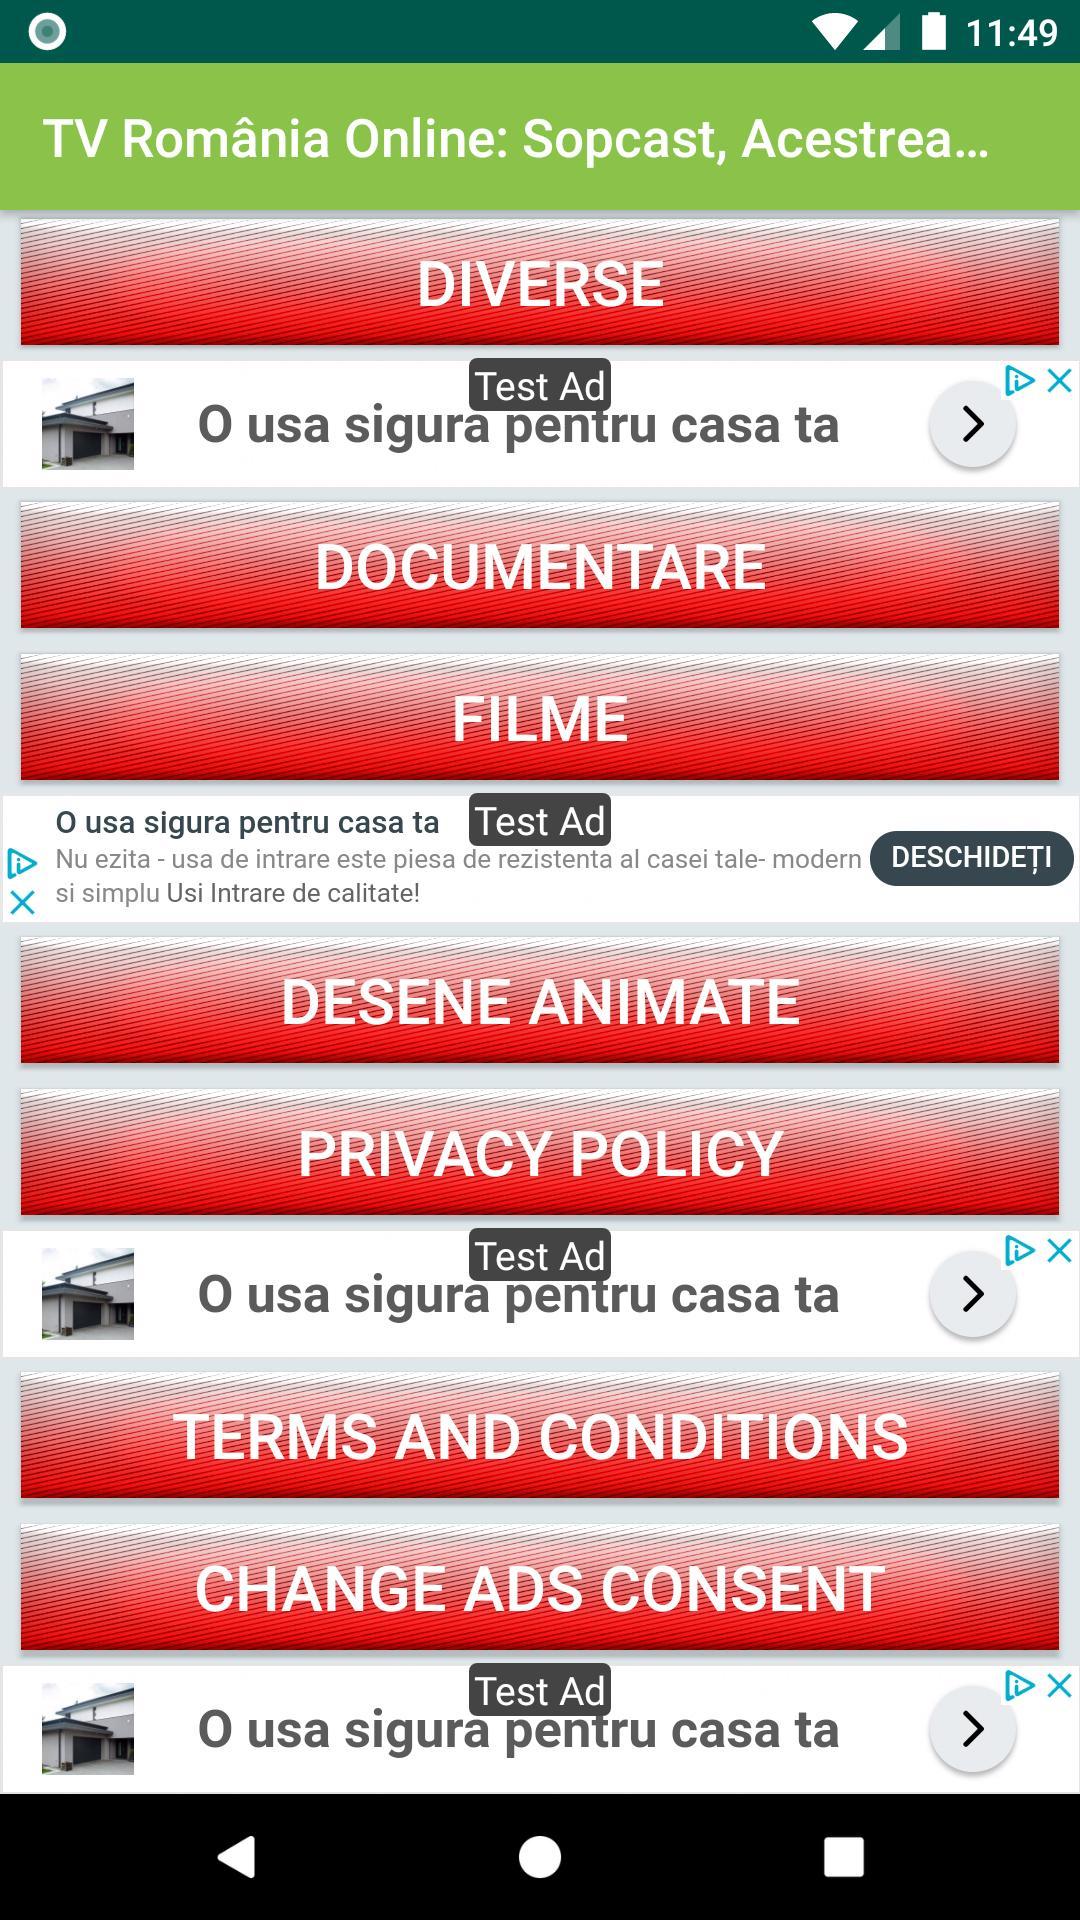 TV Romania Online Sopcast, Acestream, HTTP Streams for